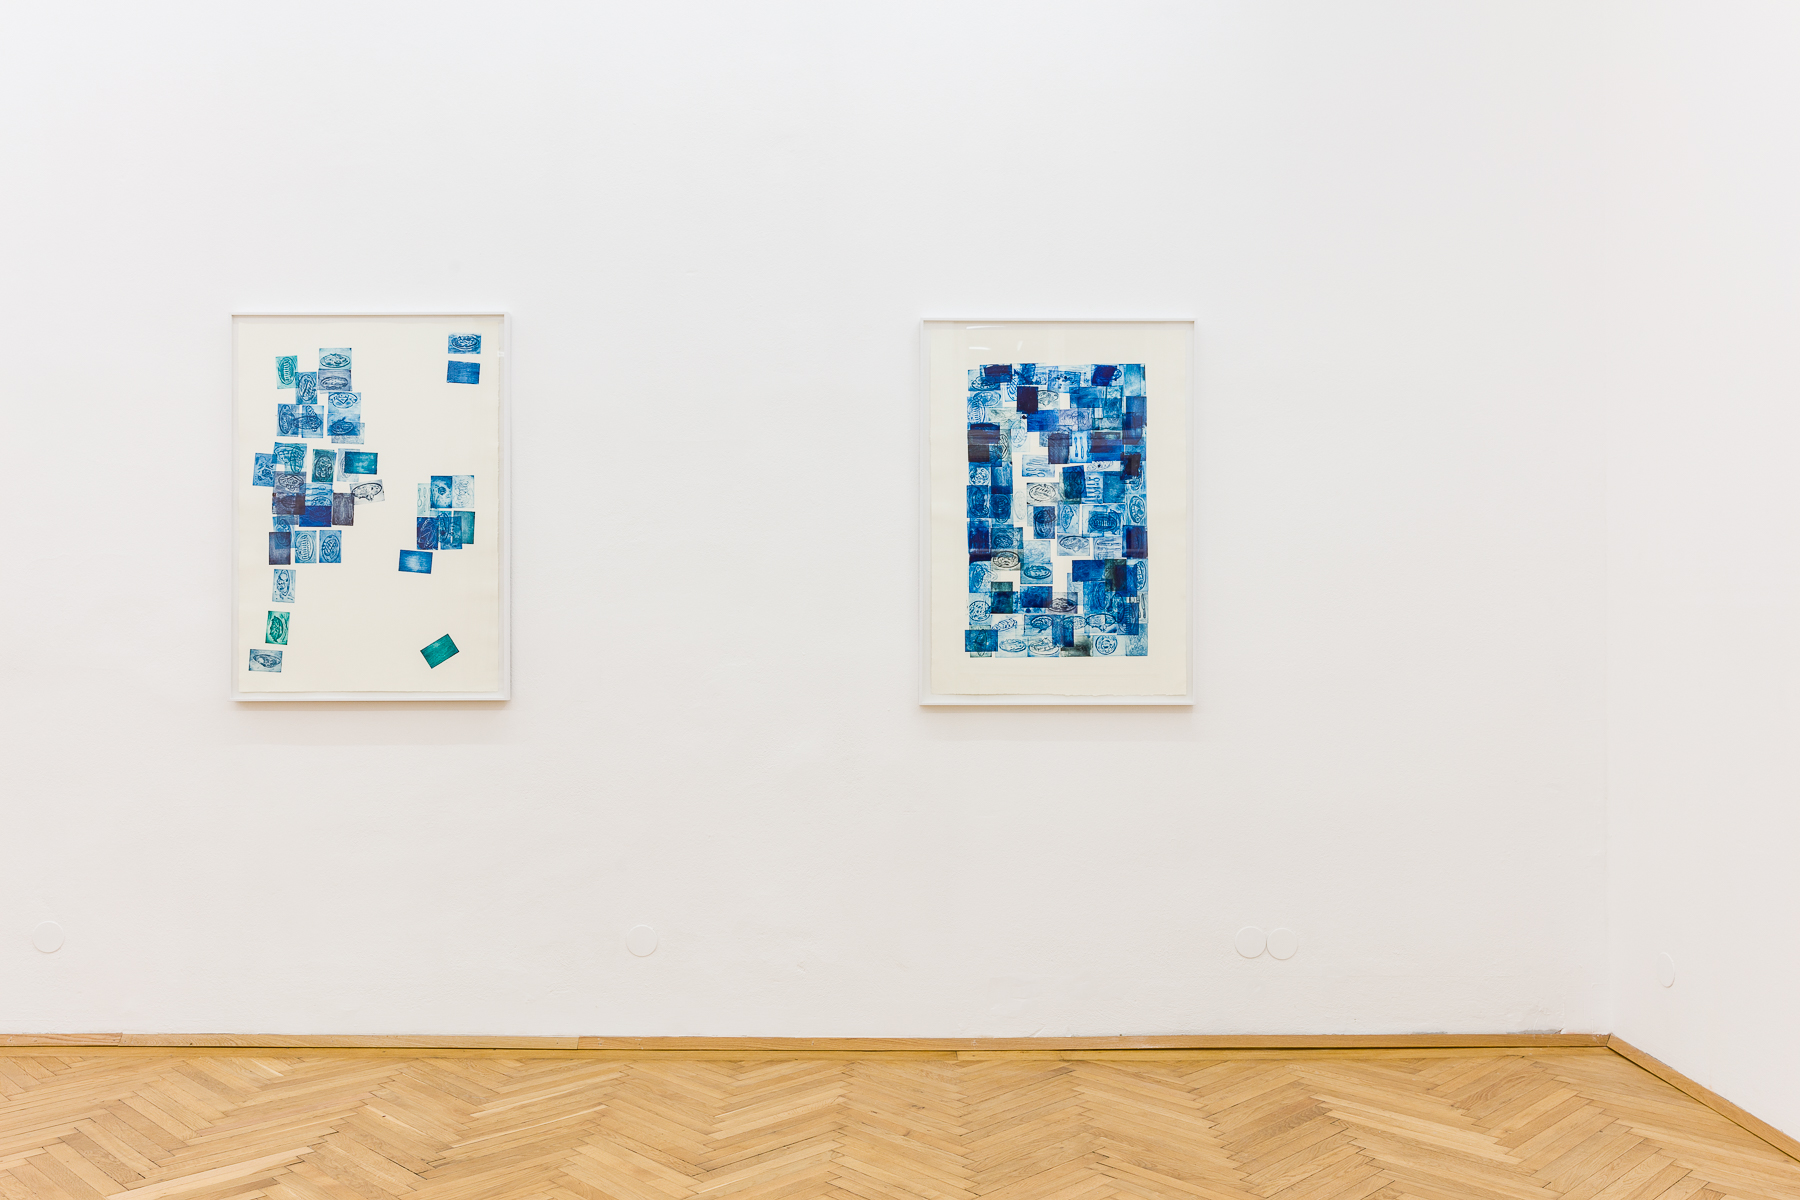 2019_01_25_Knut Ivar Aaser at Felix Gaudlitz_by kunst-dokumentationcom_010_web.jpg